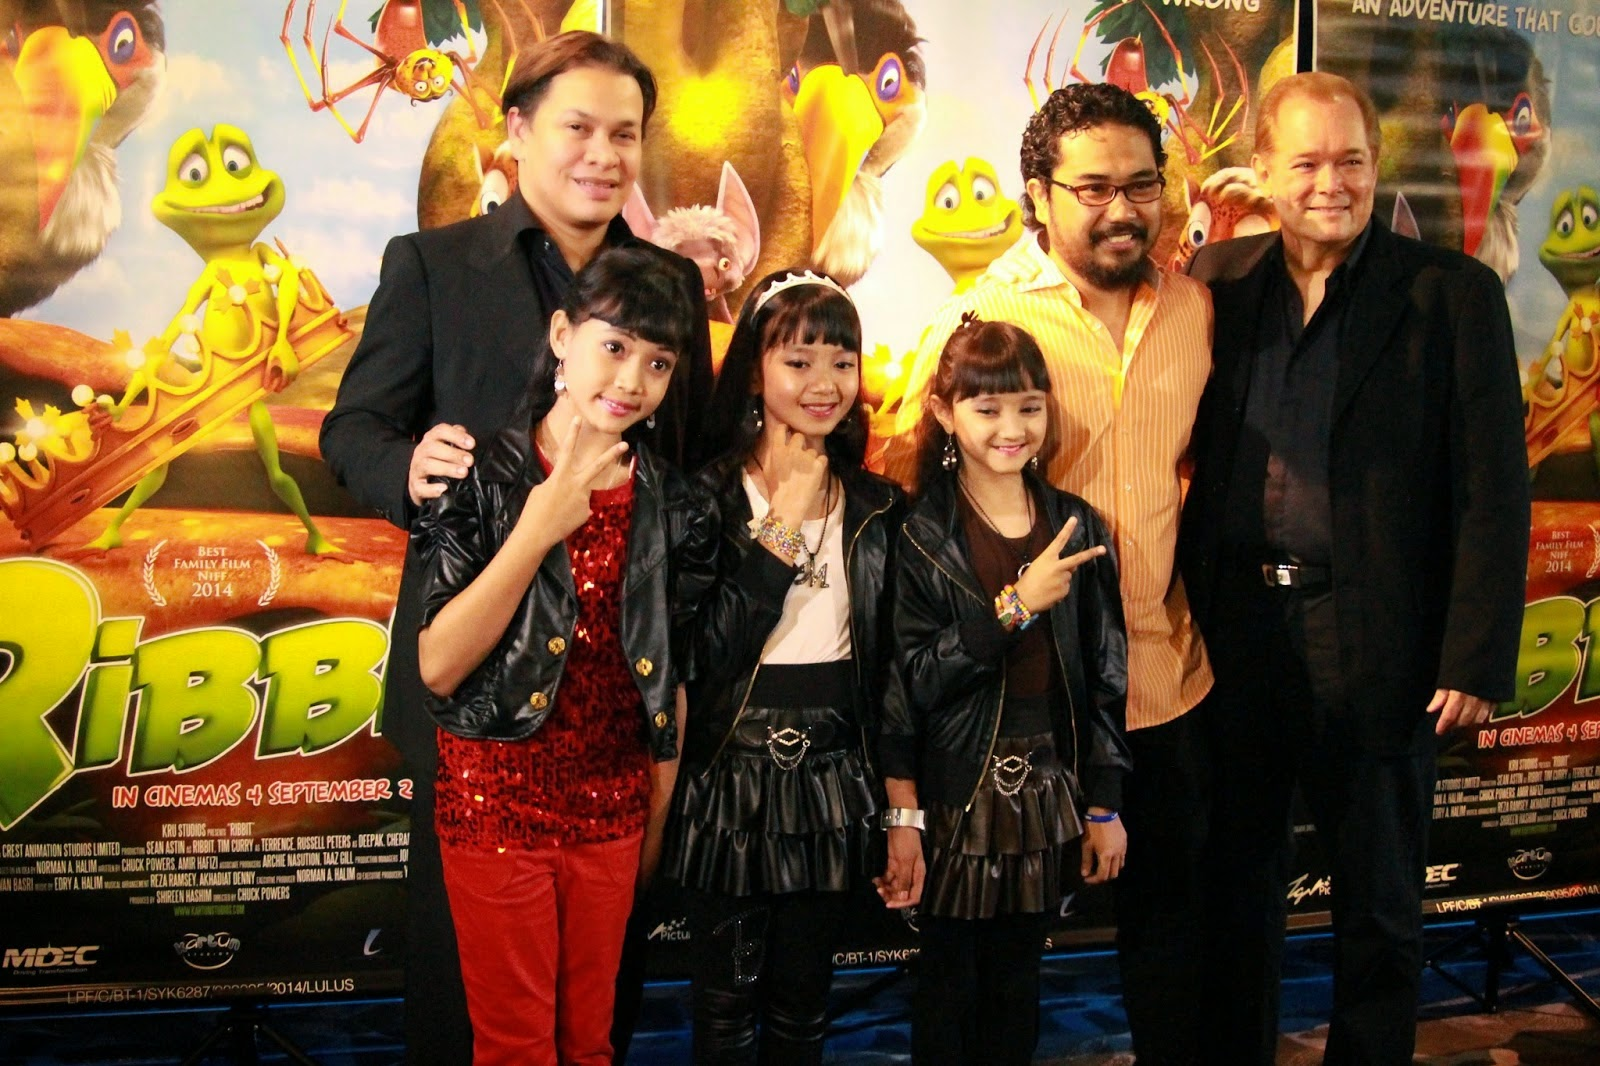 "Filem animasi 3D ""Ribbit"" versi Melayu selit pelbagai dialek , info, terkini, filem Animasi Ribbit,"